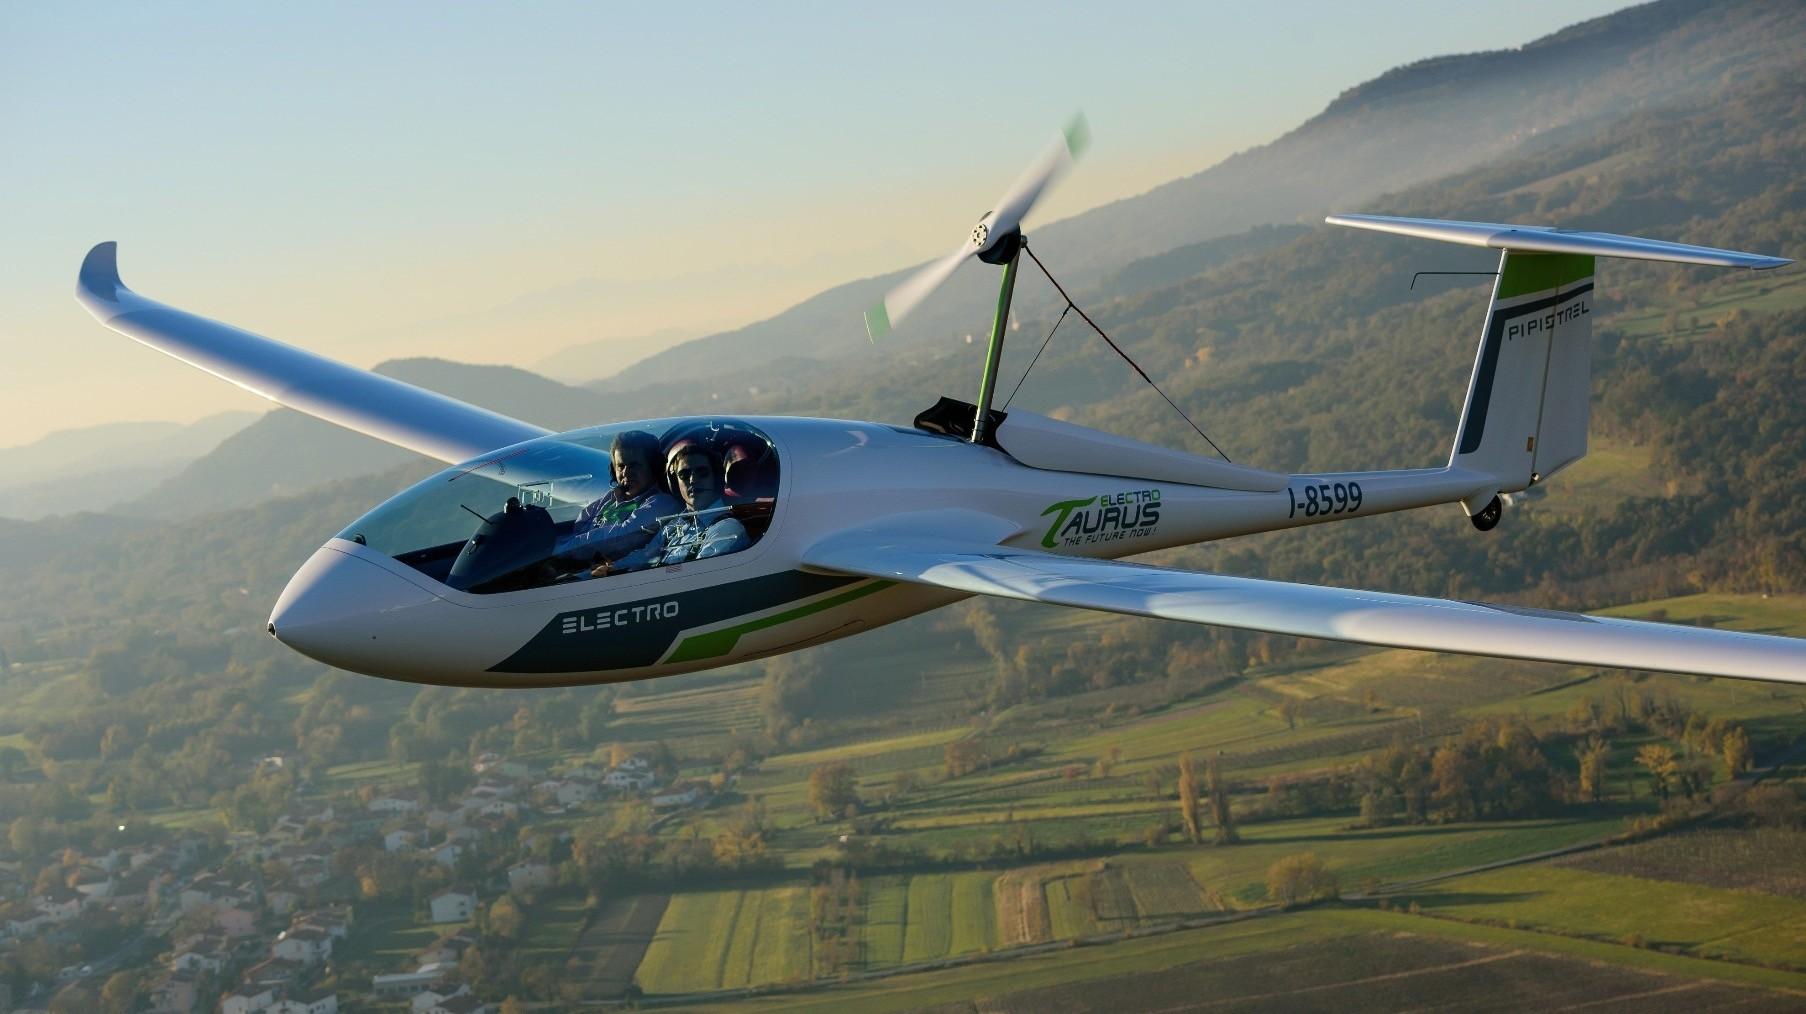 A Pipistrel Taurus Electro electric two-seat airplane flies above Ajdovscina.